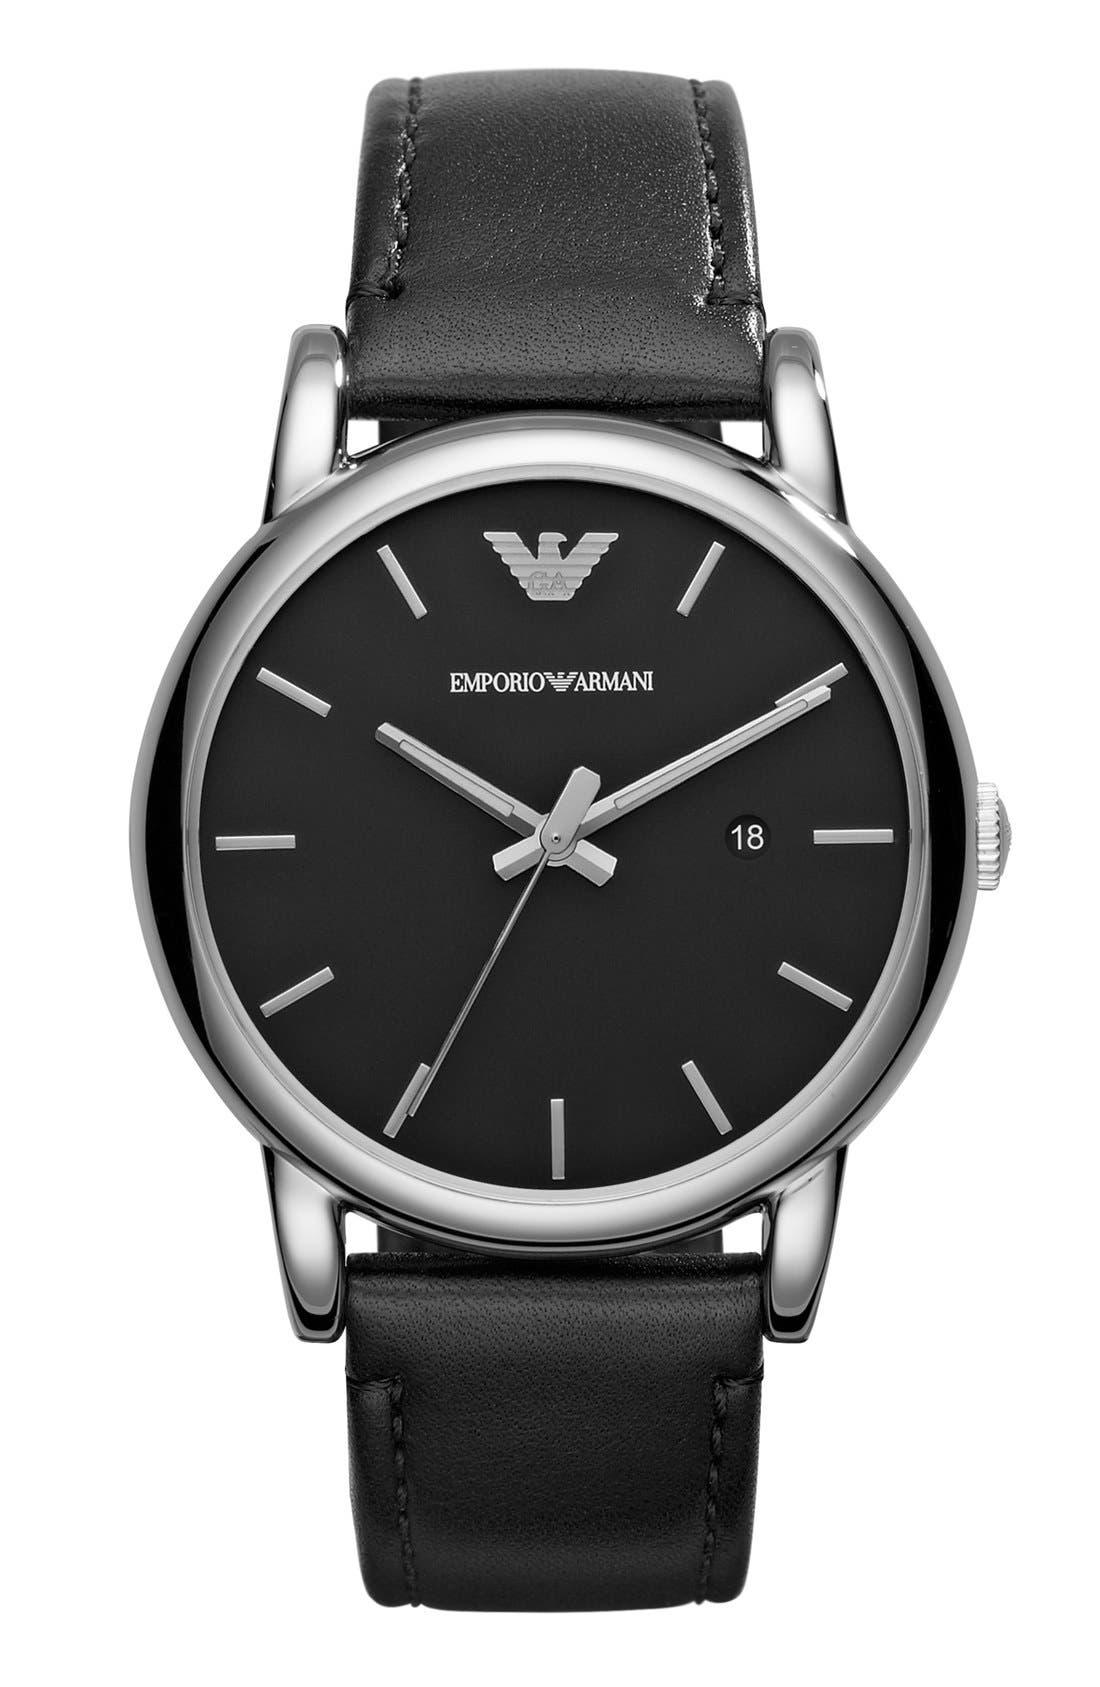 Main Image - Emporio Armani Leather Strap Watch, 41mm